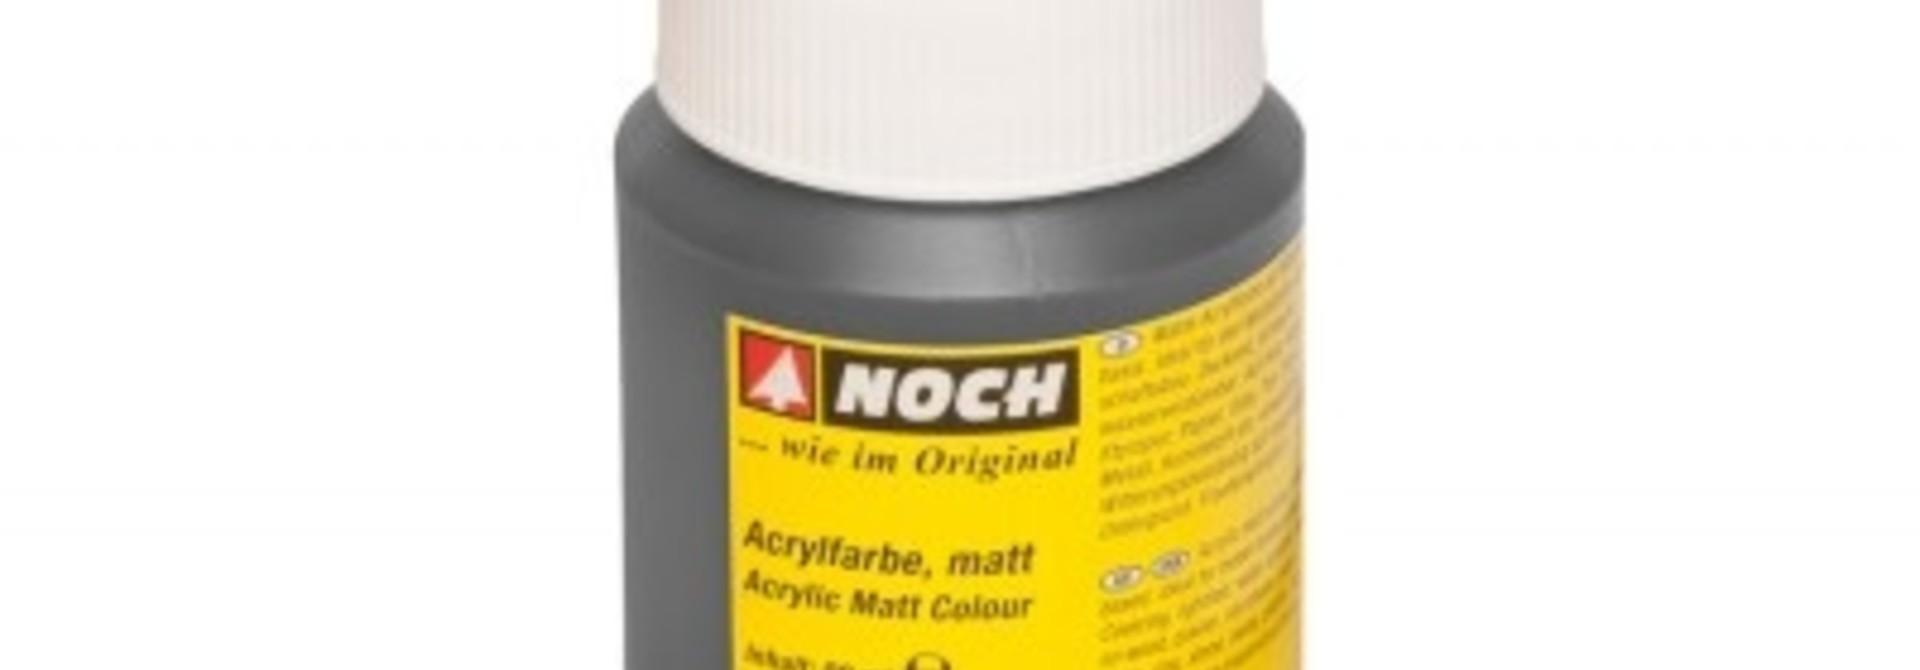 61197    Acrylfarbe, matt, schwarz